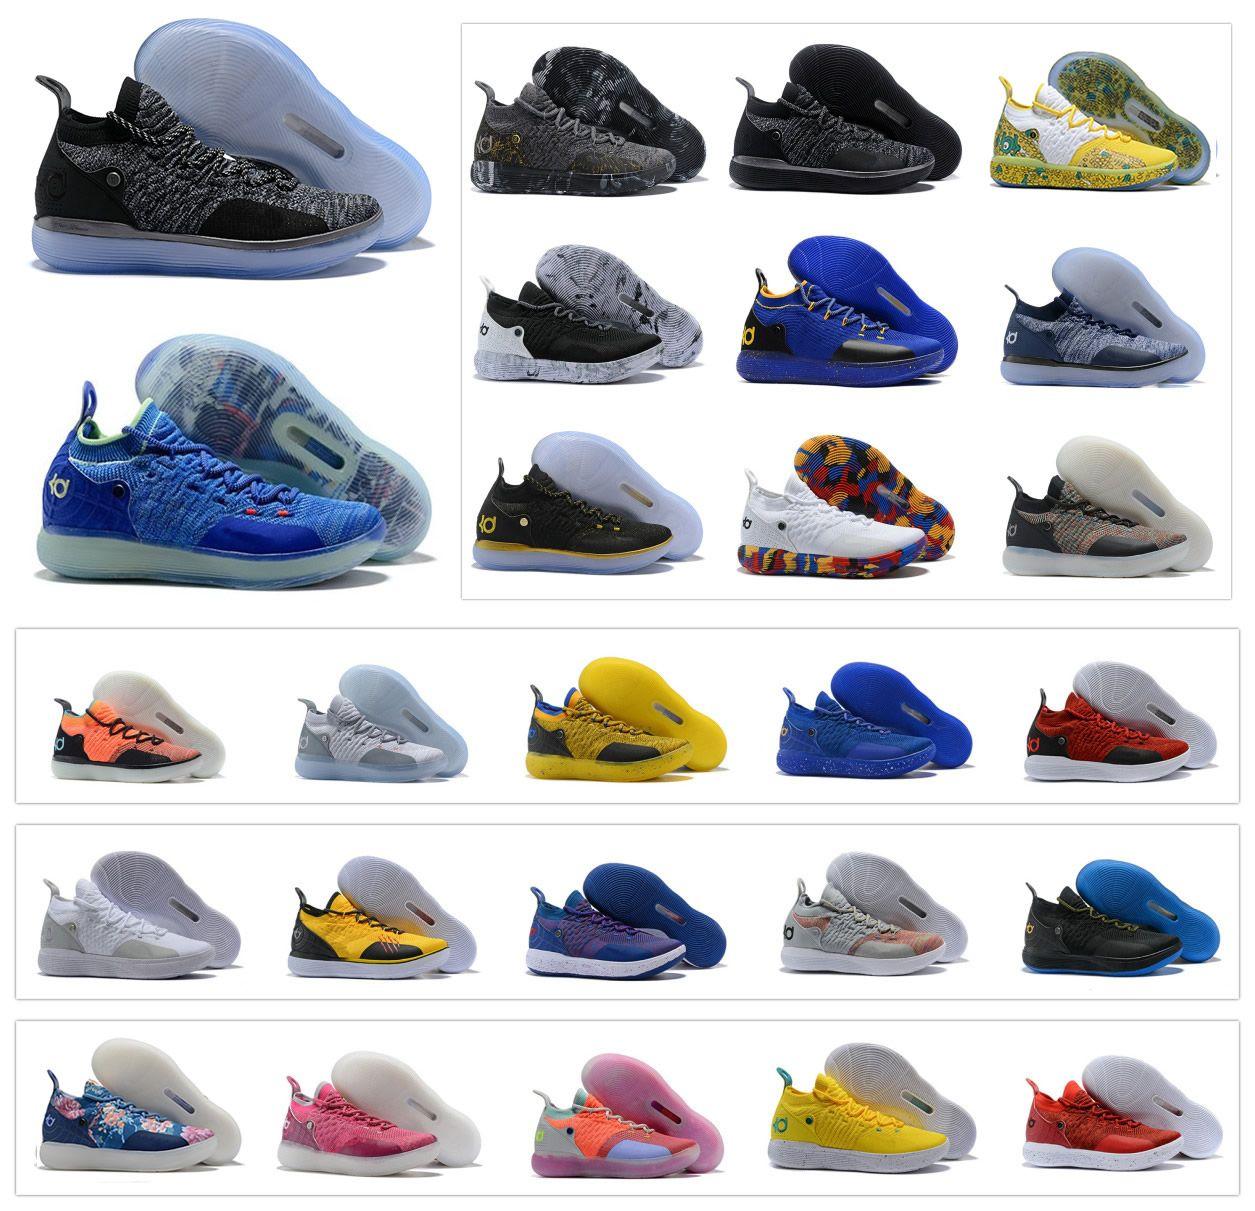 official photos 557b8 ba8a7 Großhandel Heiße Männer 2019 Kevin Durant KD 11 11S Multi Color KD11 XI  Sneakers WEISS Zoom X Jubiläumsschuhe Basketballschuhe X Elite Mid Sport  Sneakers 40 ...